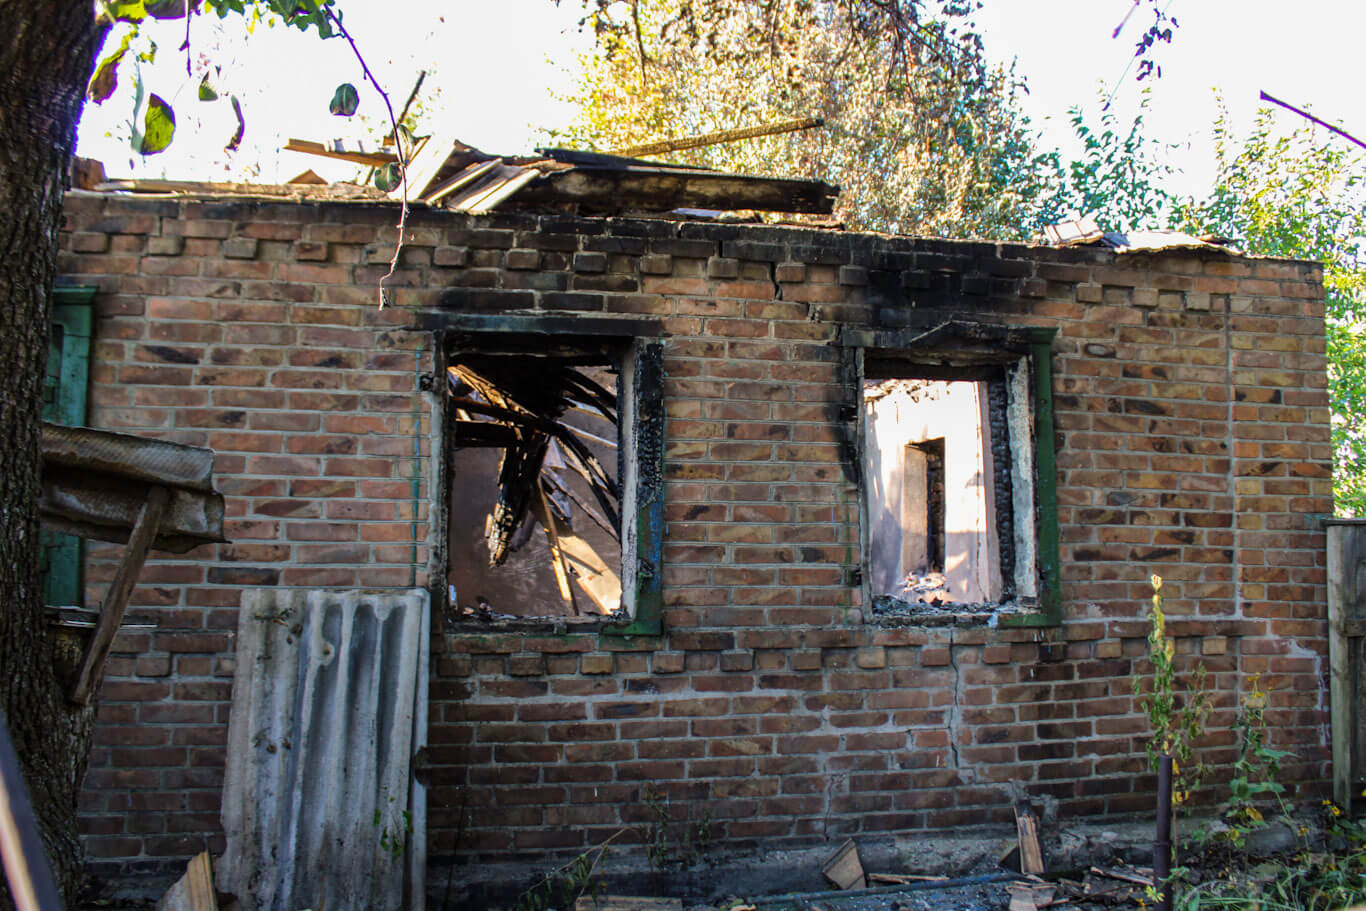 Donbass War Diary burned home